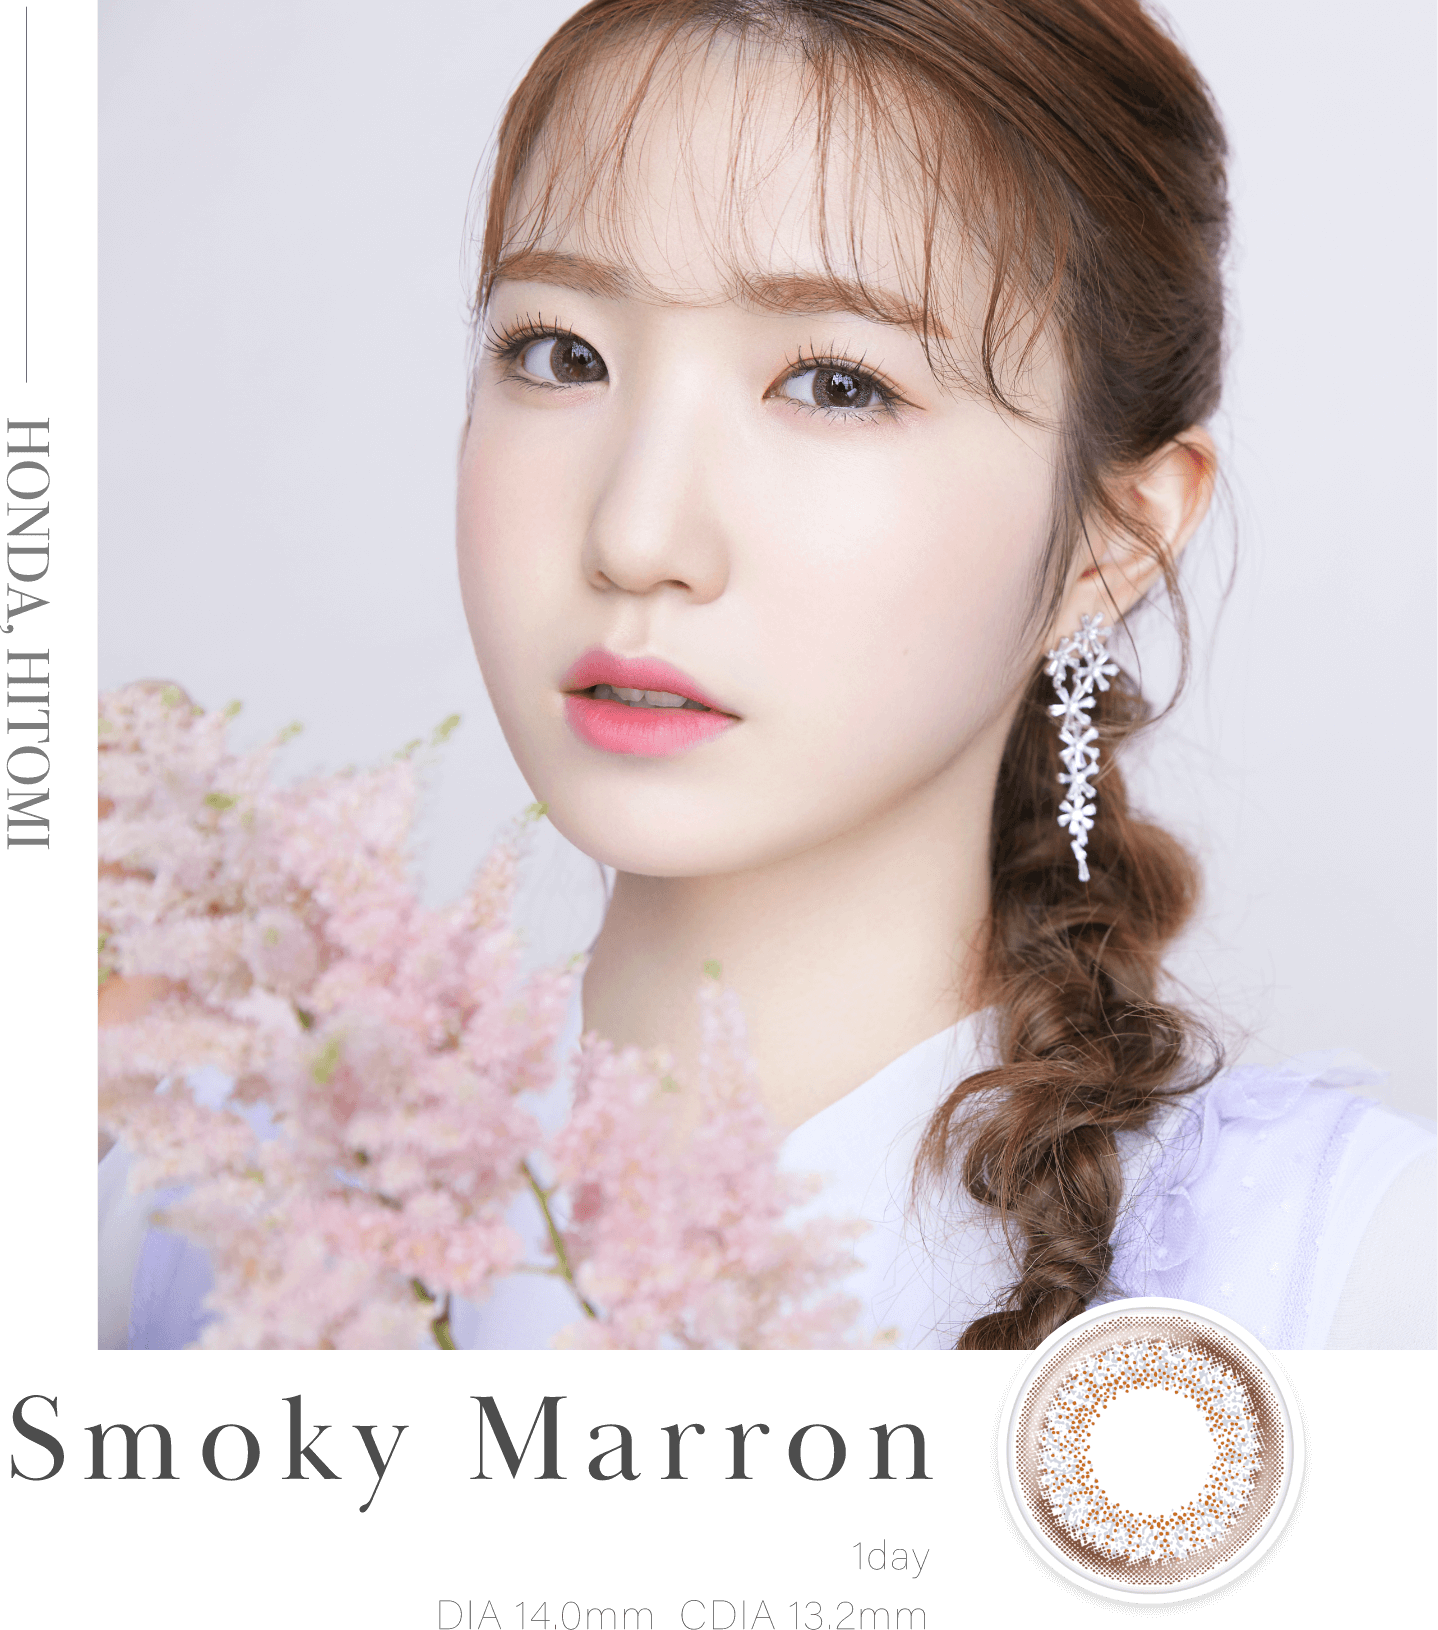 Smoky marron